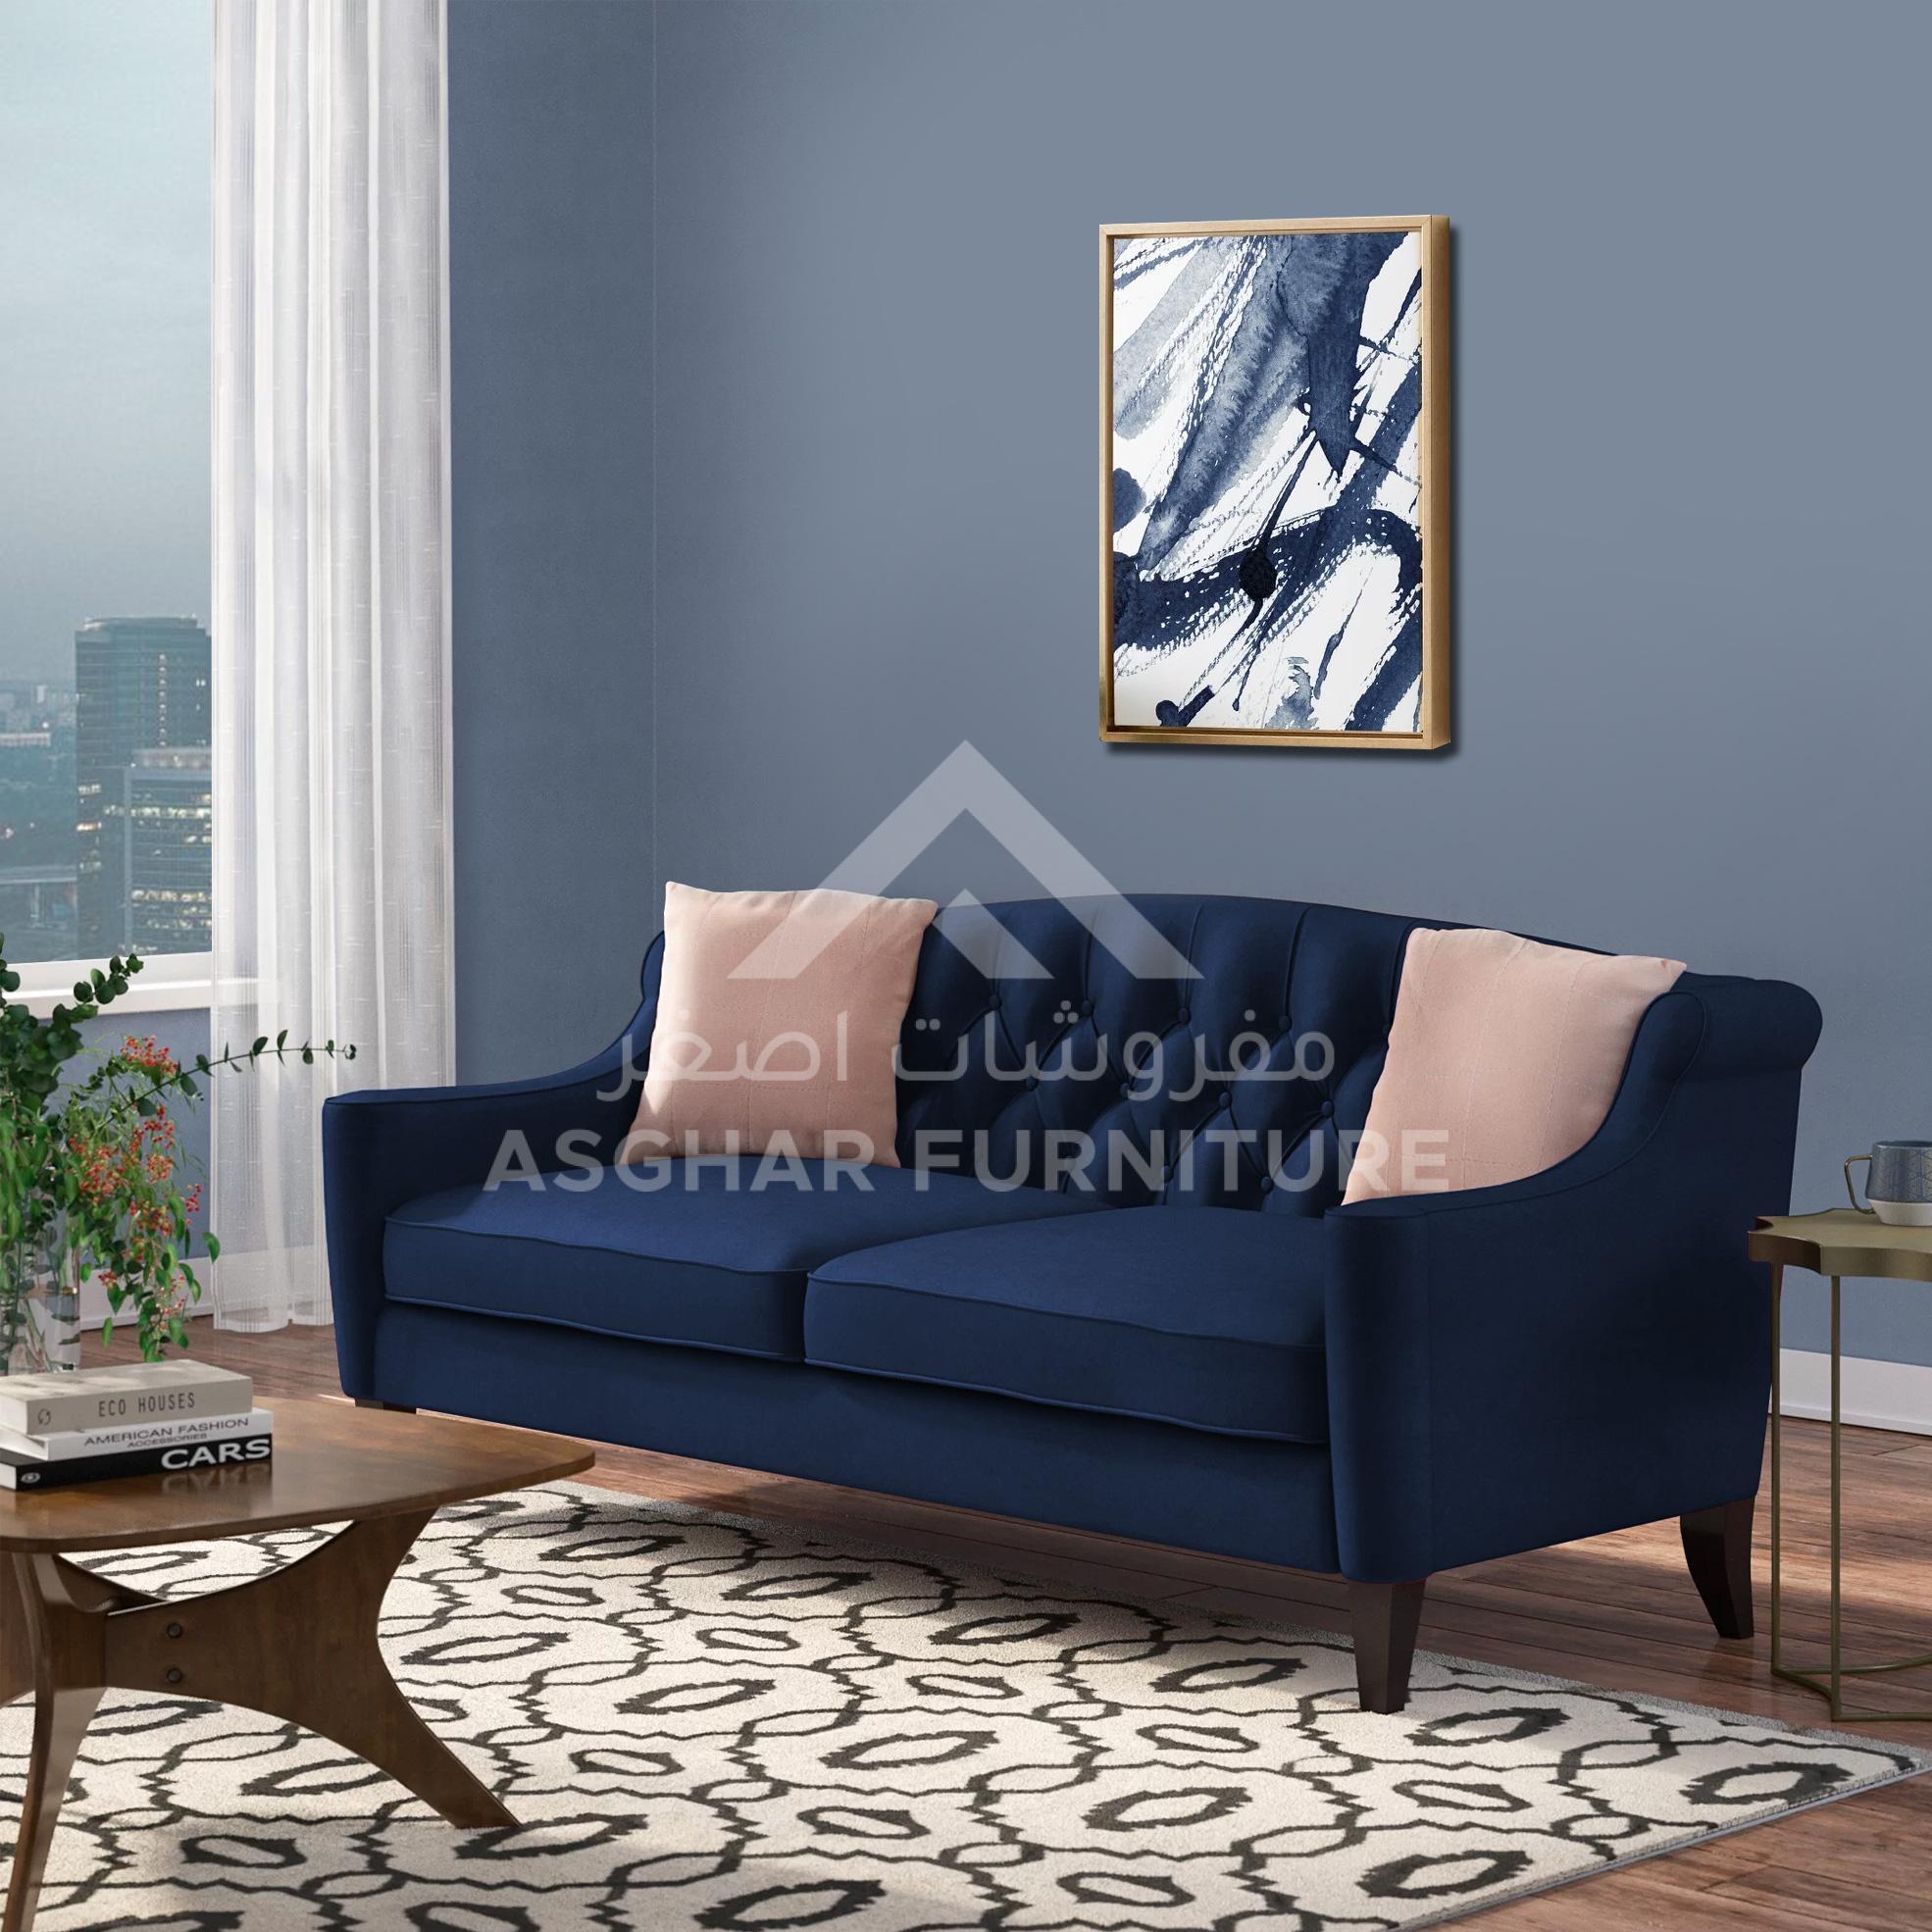 Vince recessed arm sofa | sofa furniture online